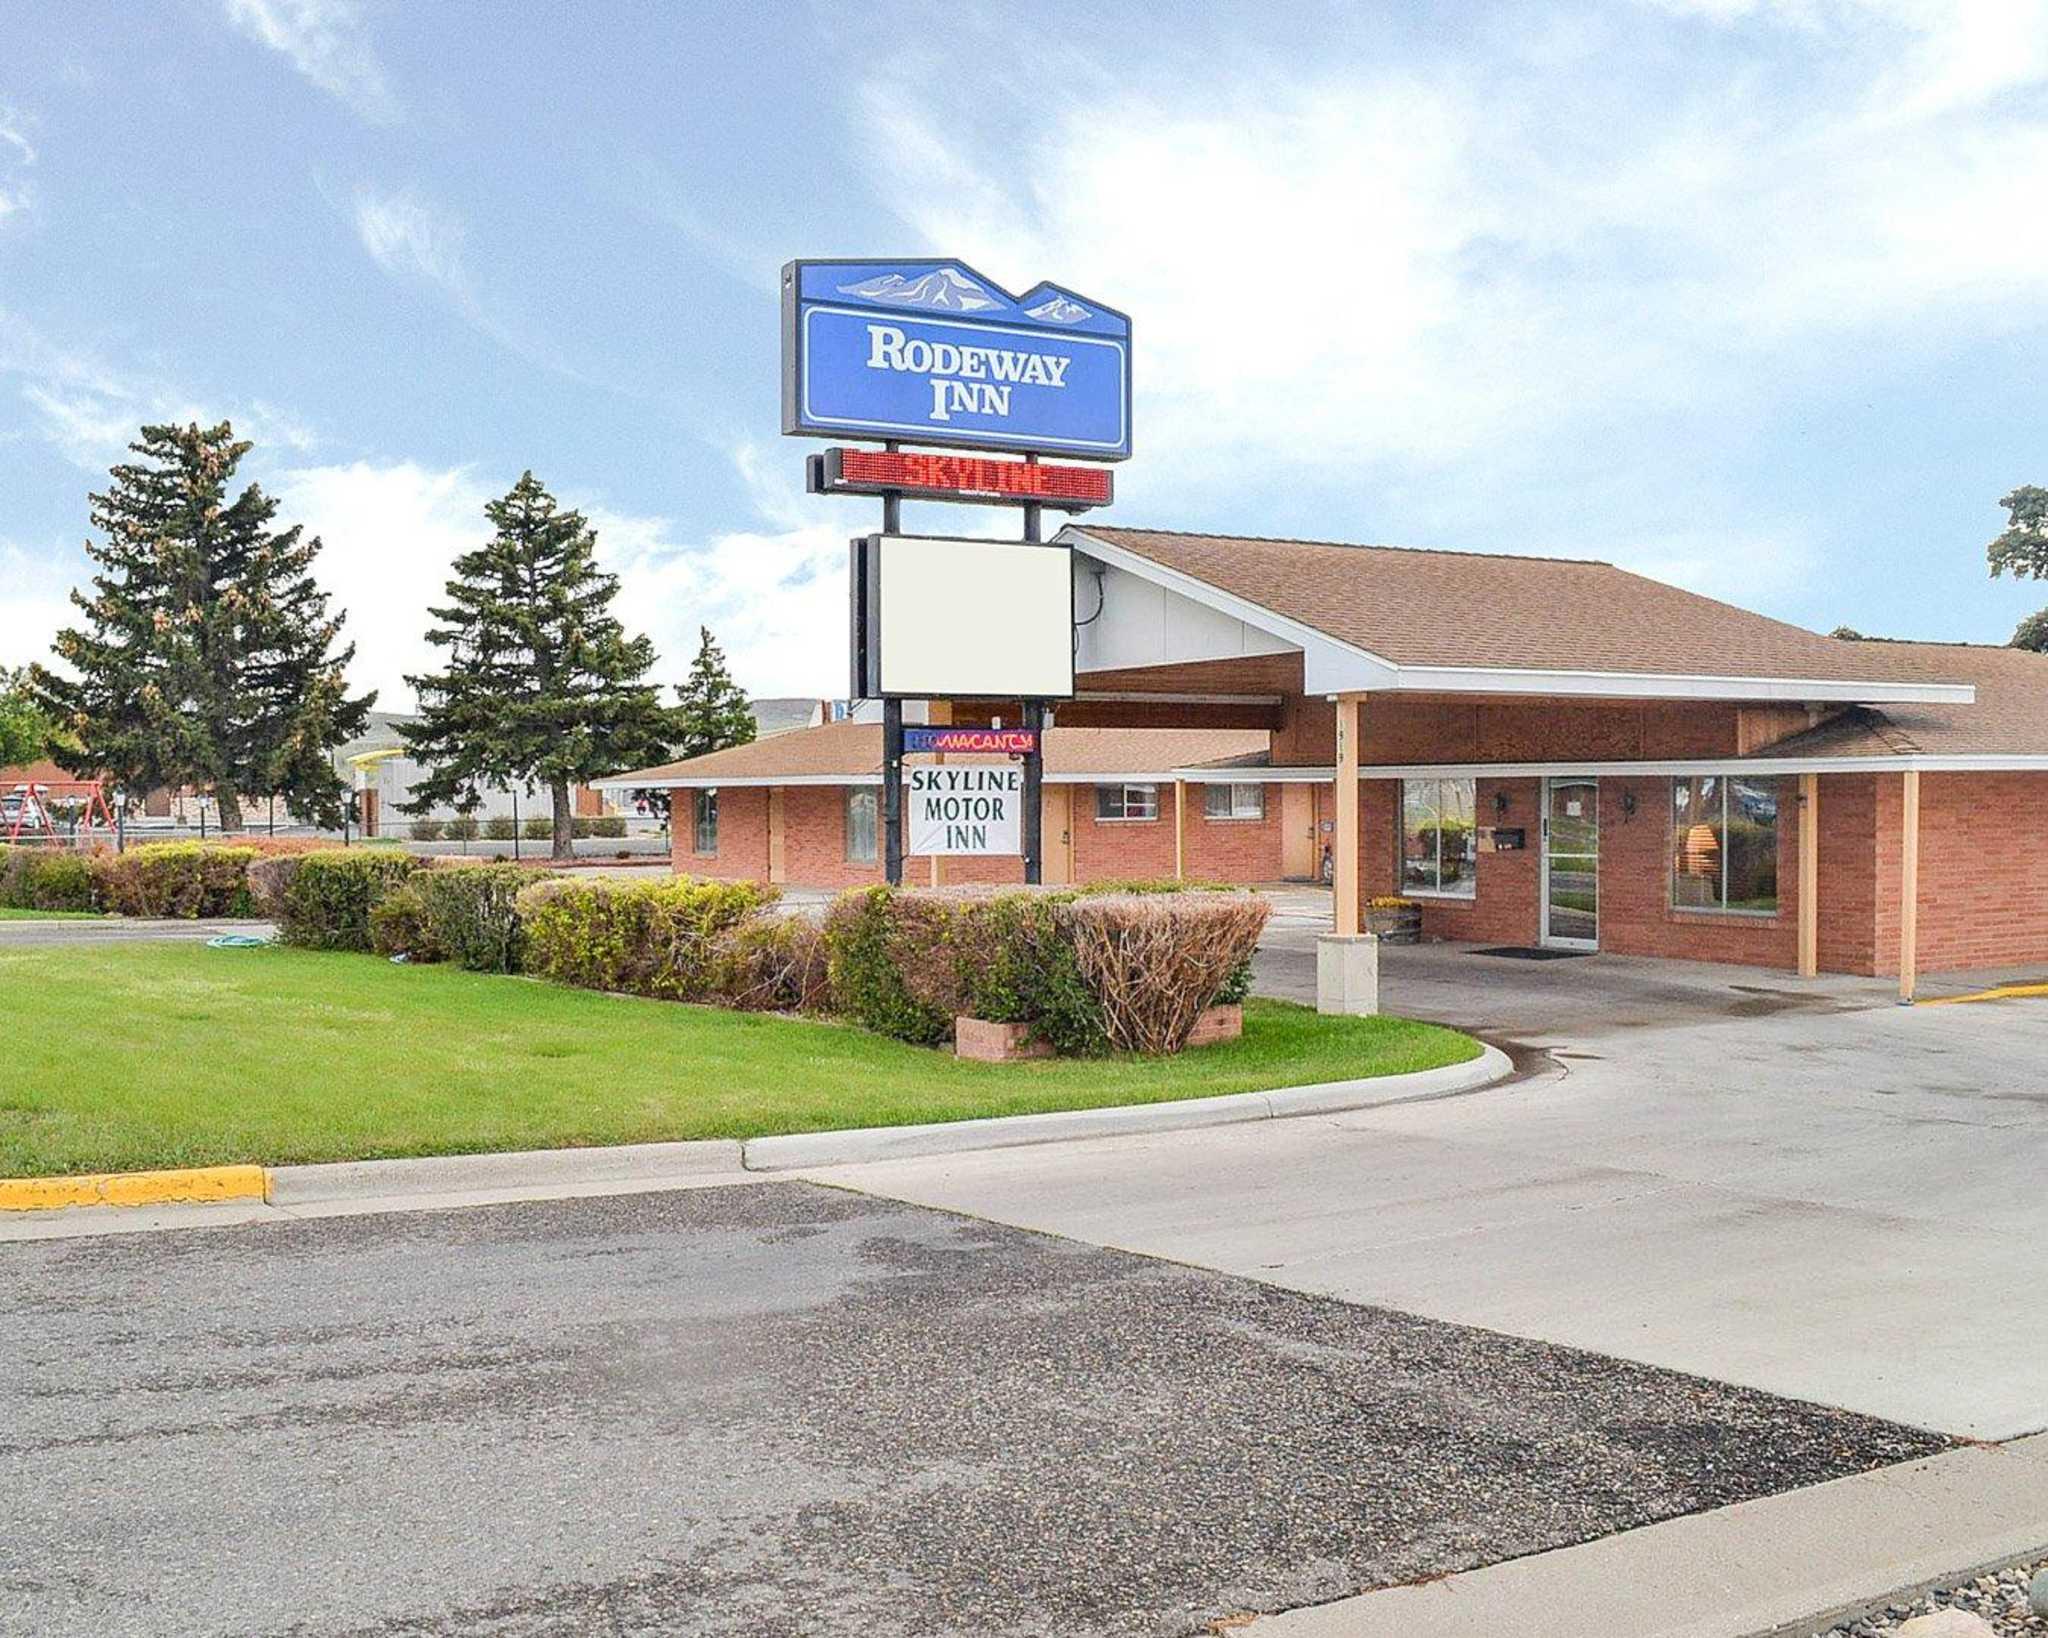 Rodeway Inn Cody Wyoming Wy